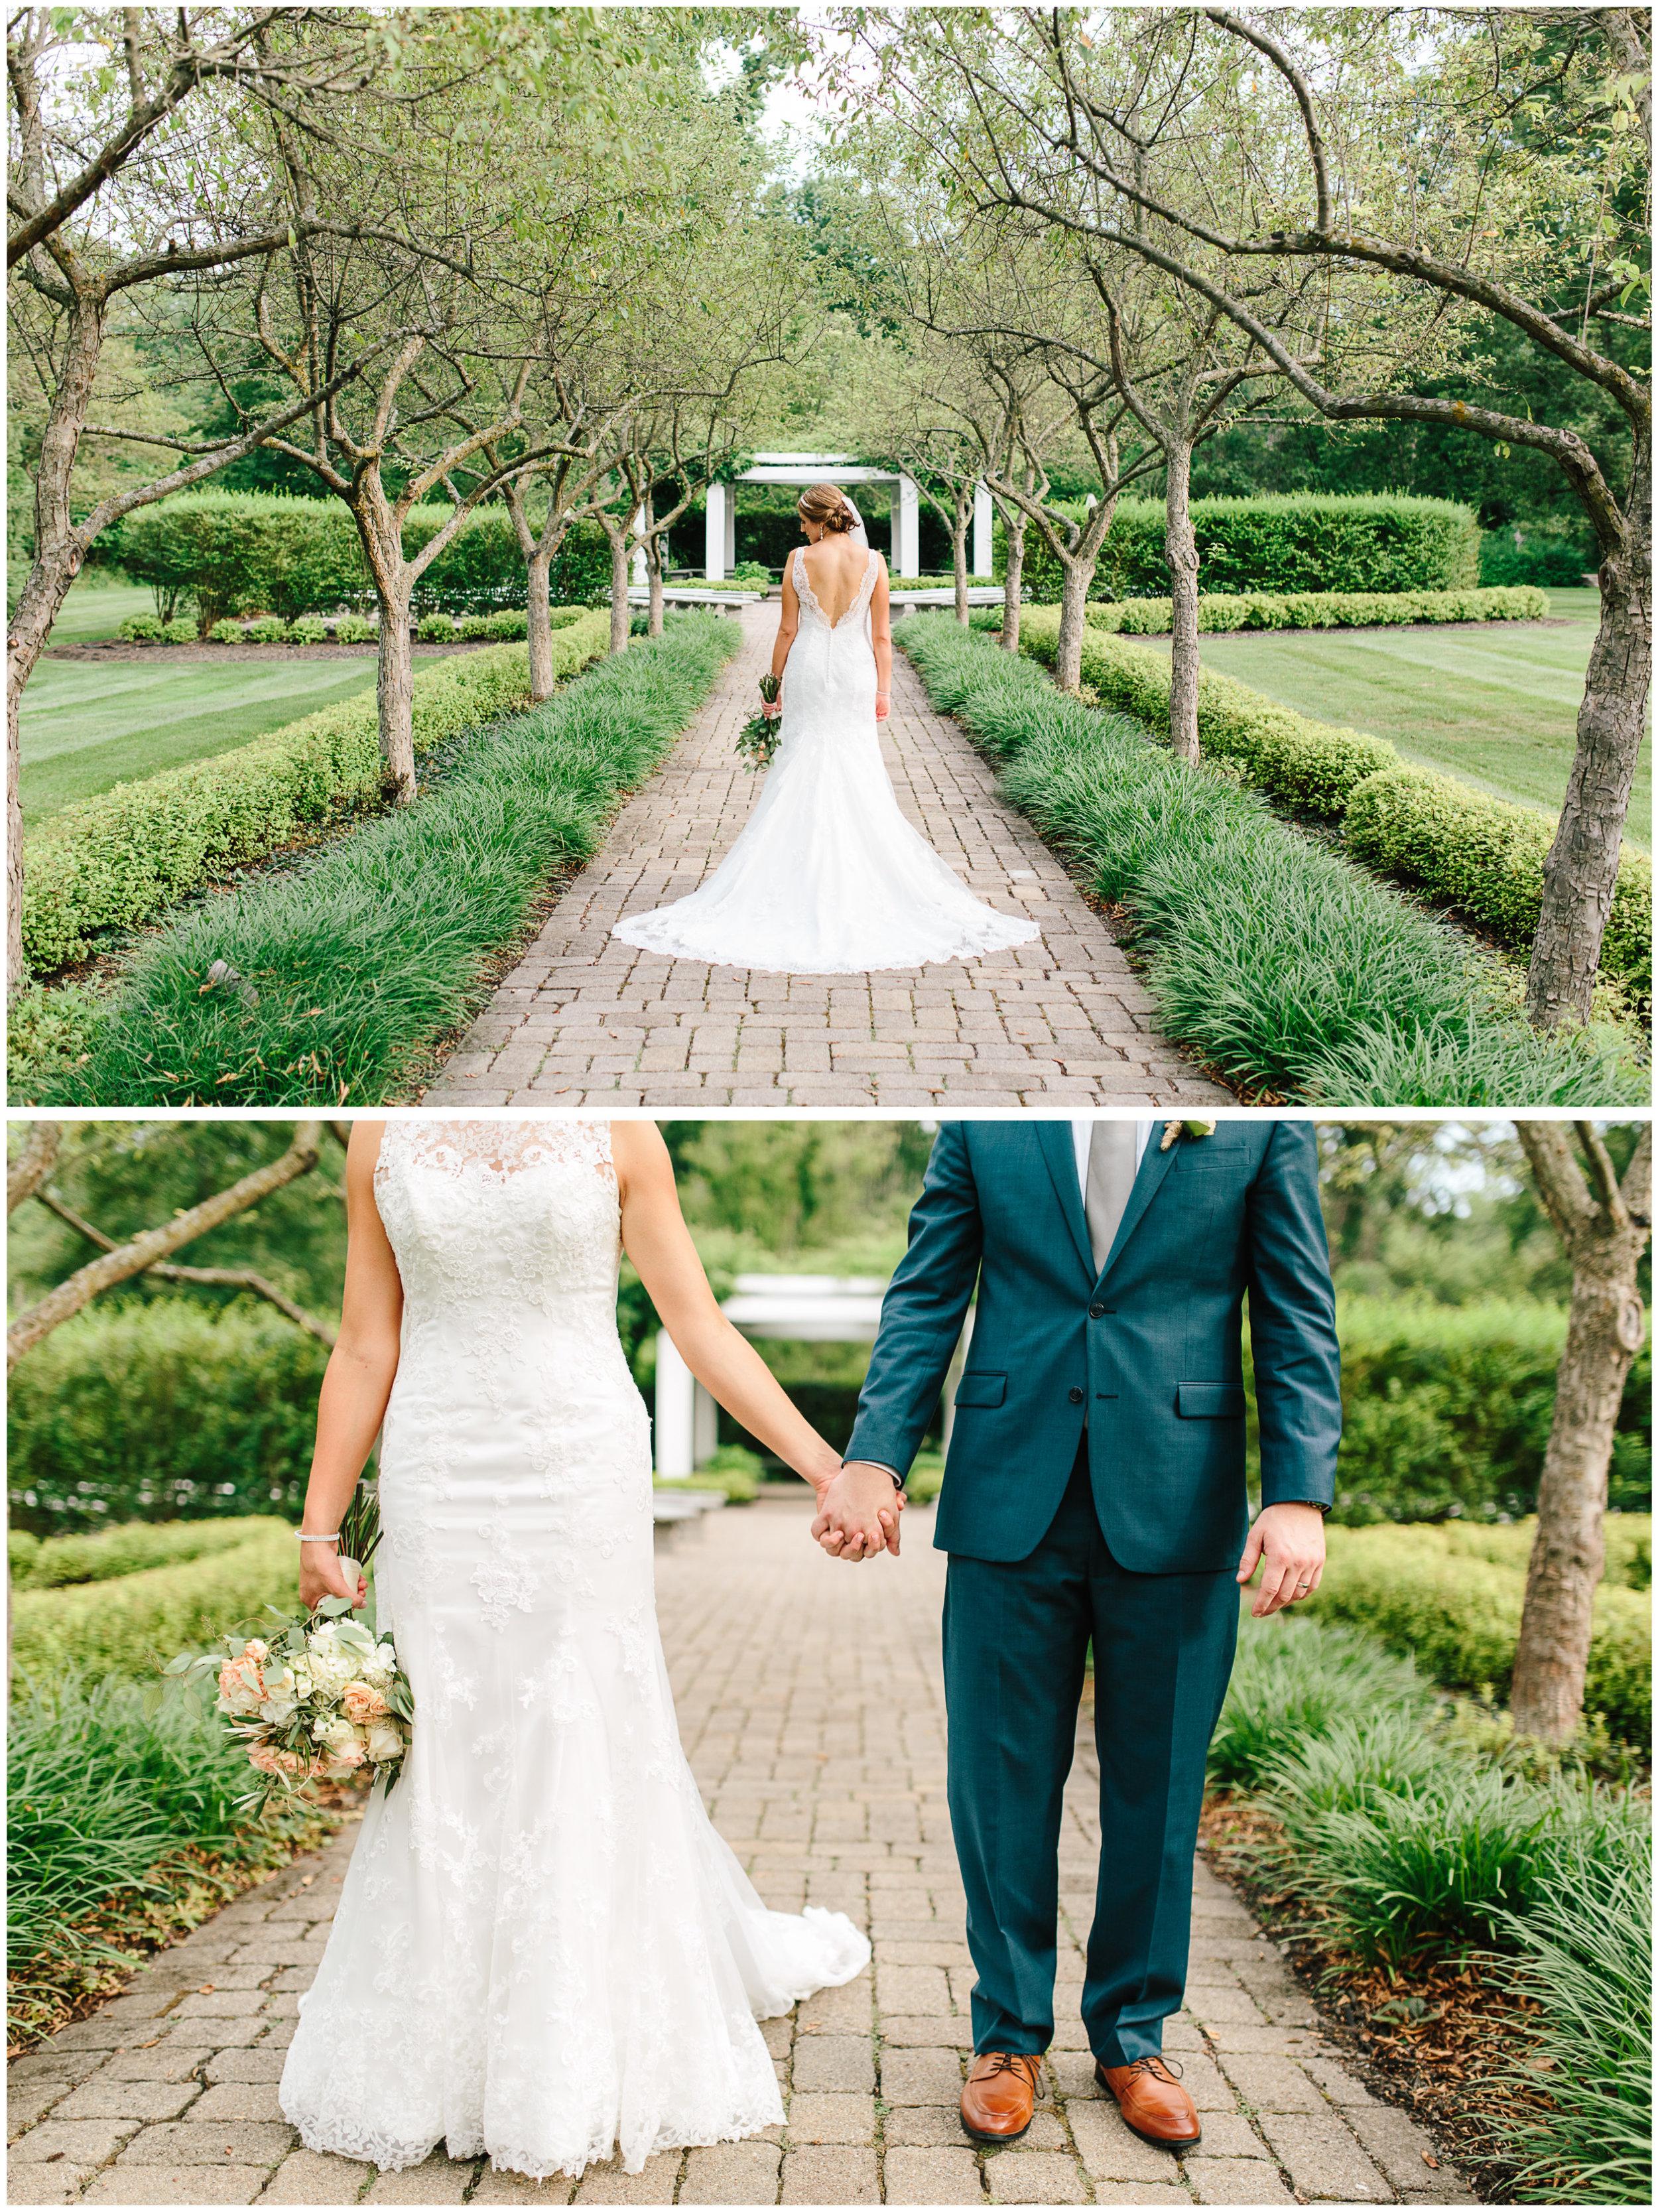 ann_arbor_michigan_wedding_47.jpg